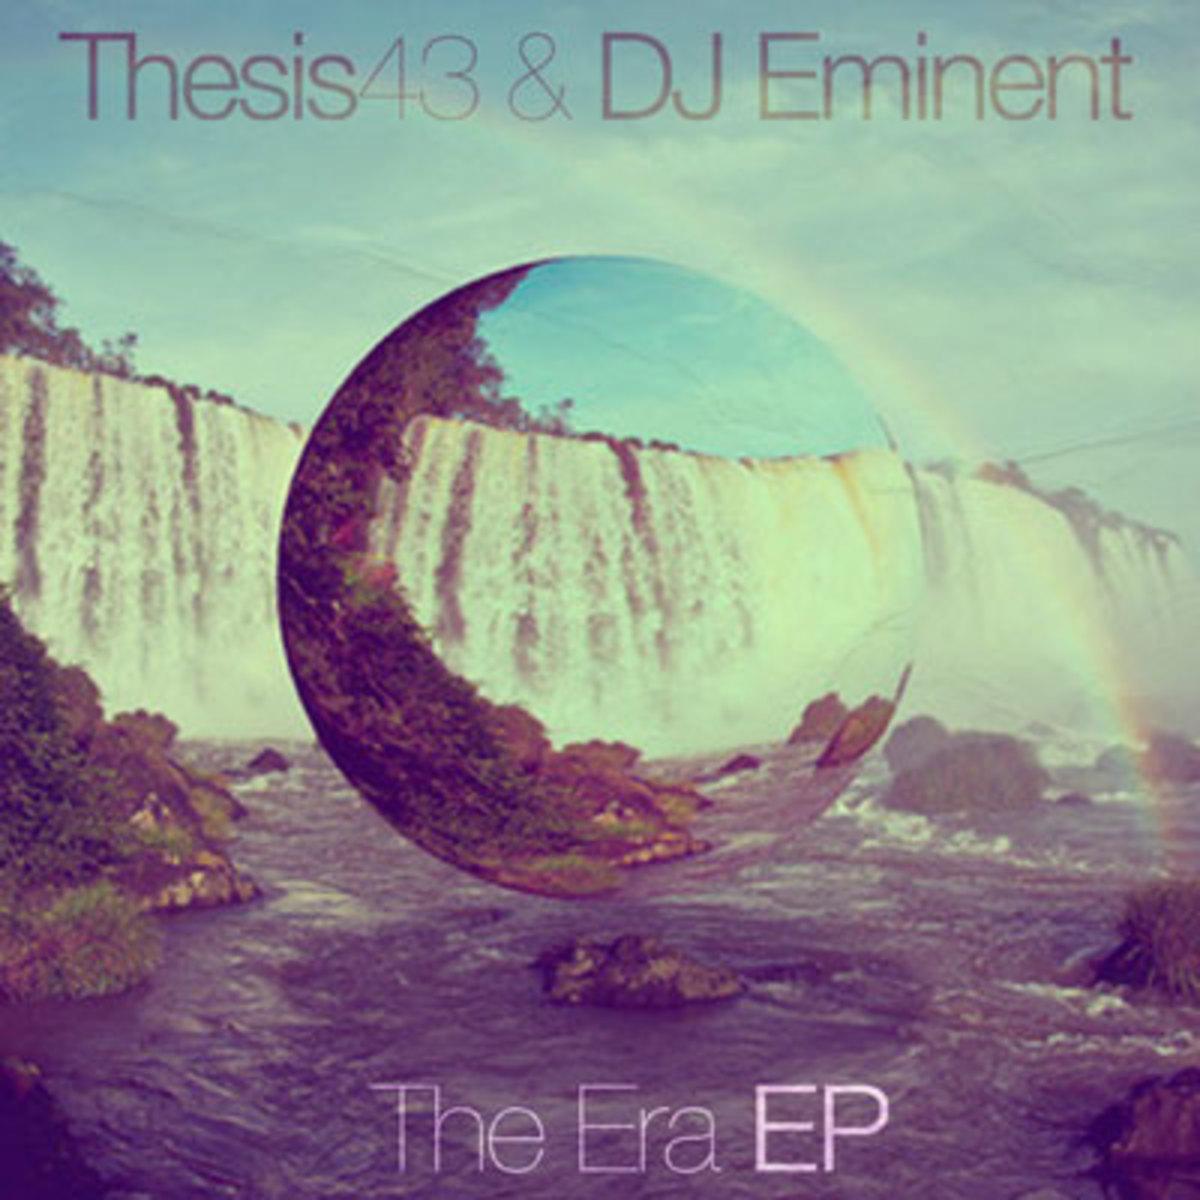 thesis43-theera.jpg